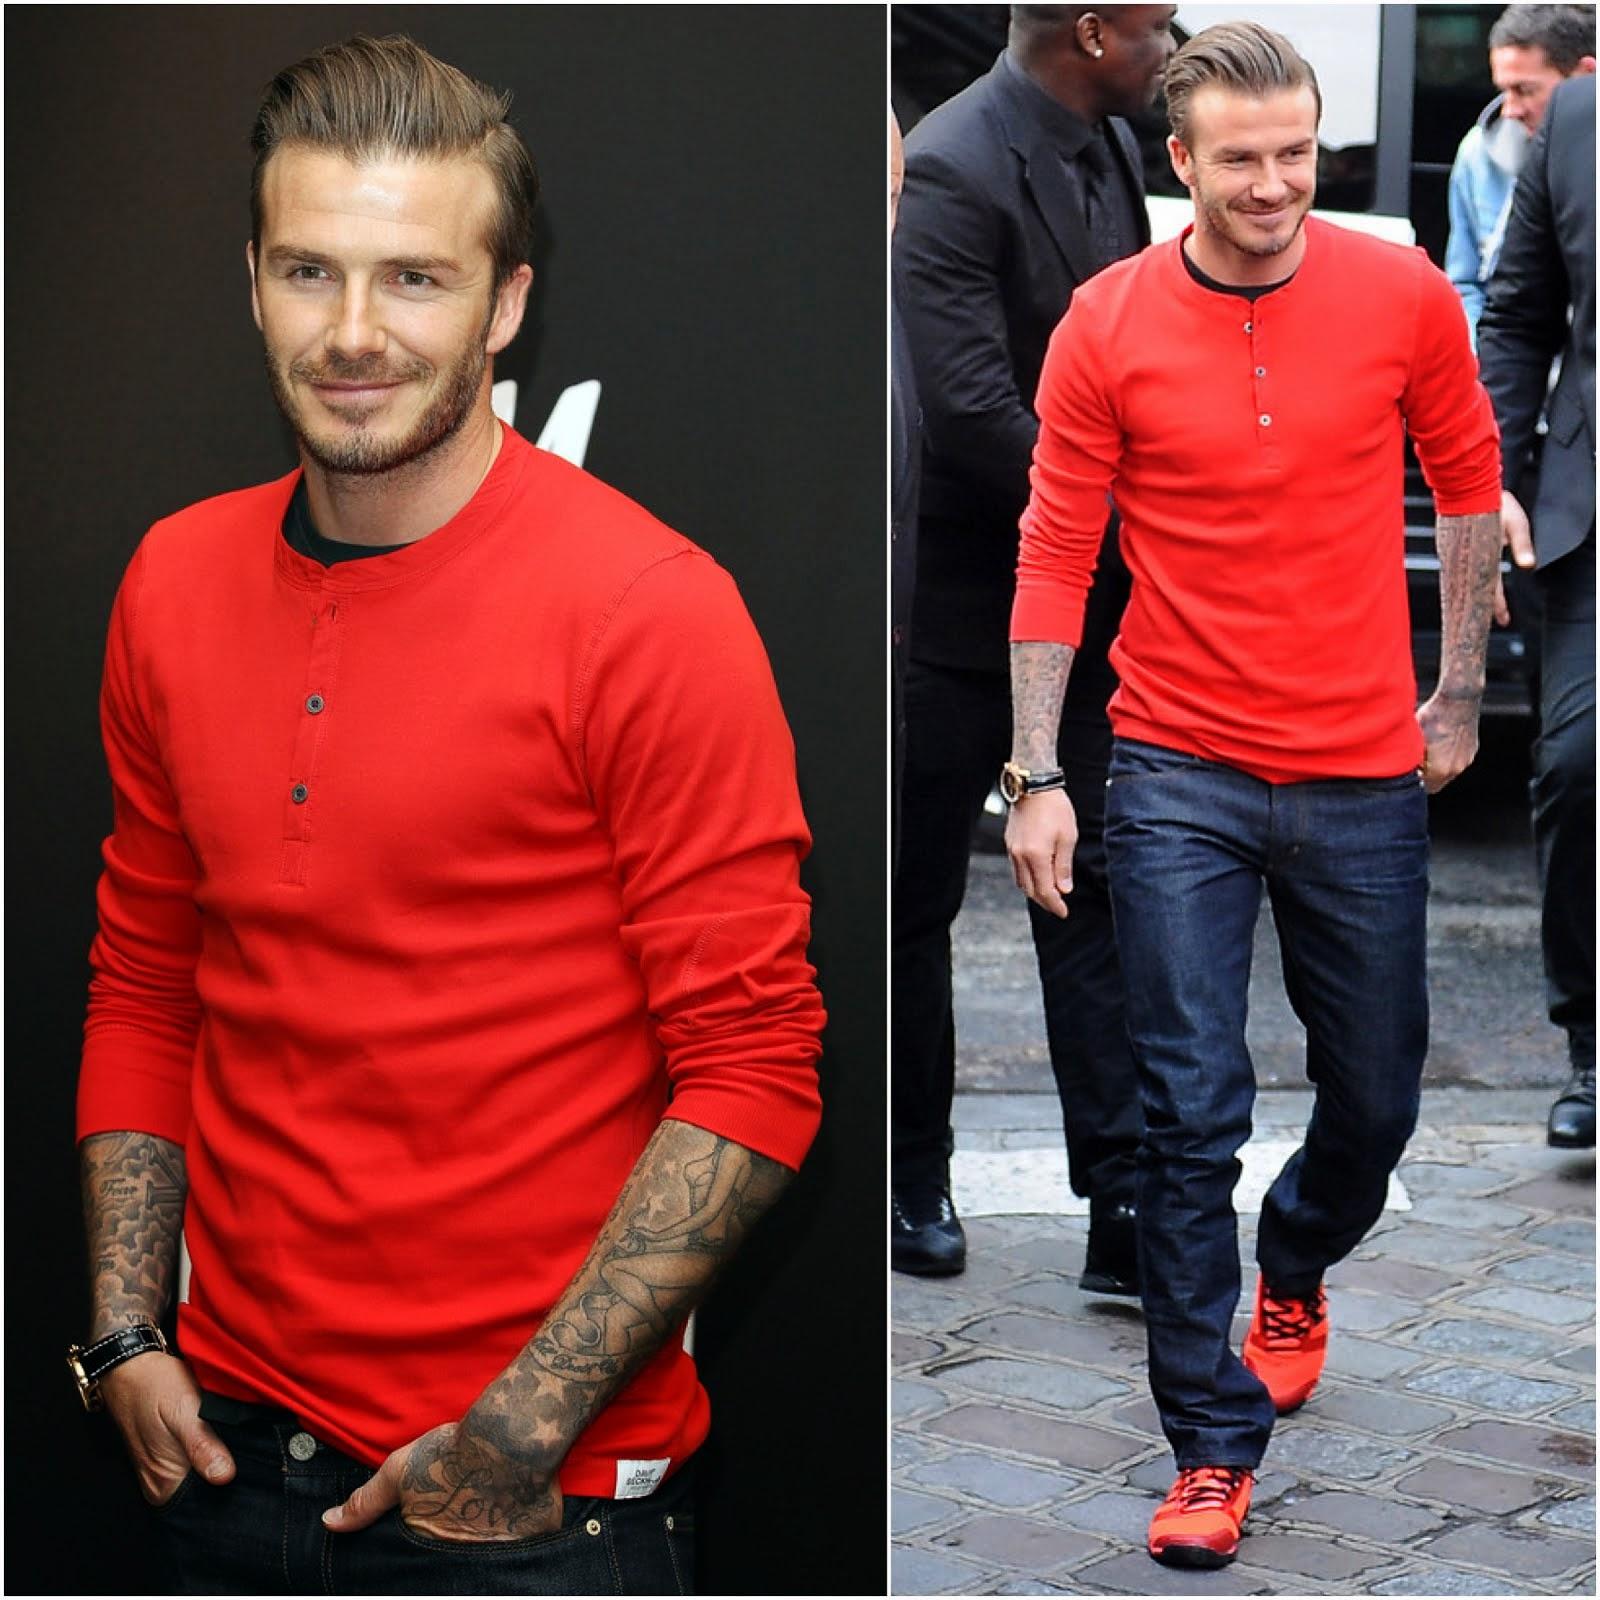 00O00 Menswear Blog: David Beckham in H&M - Paris store appearance